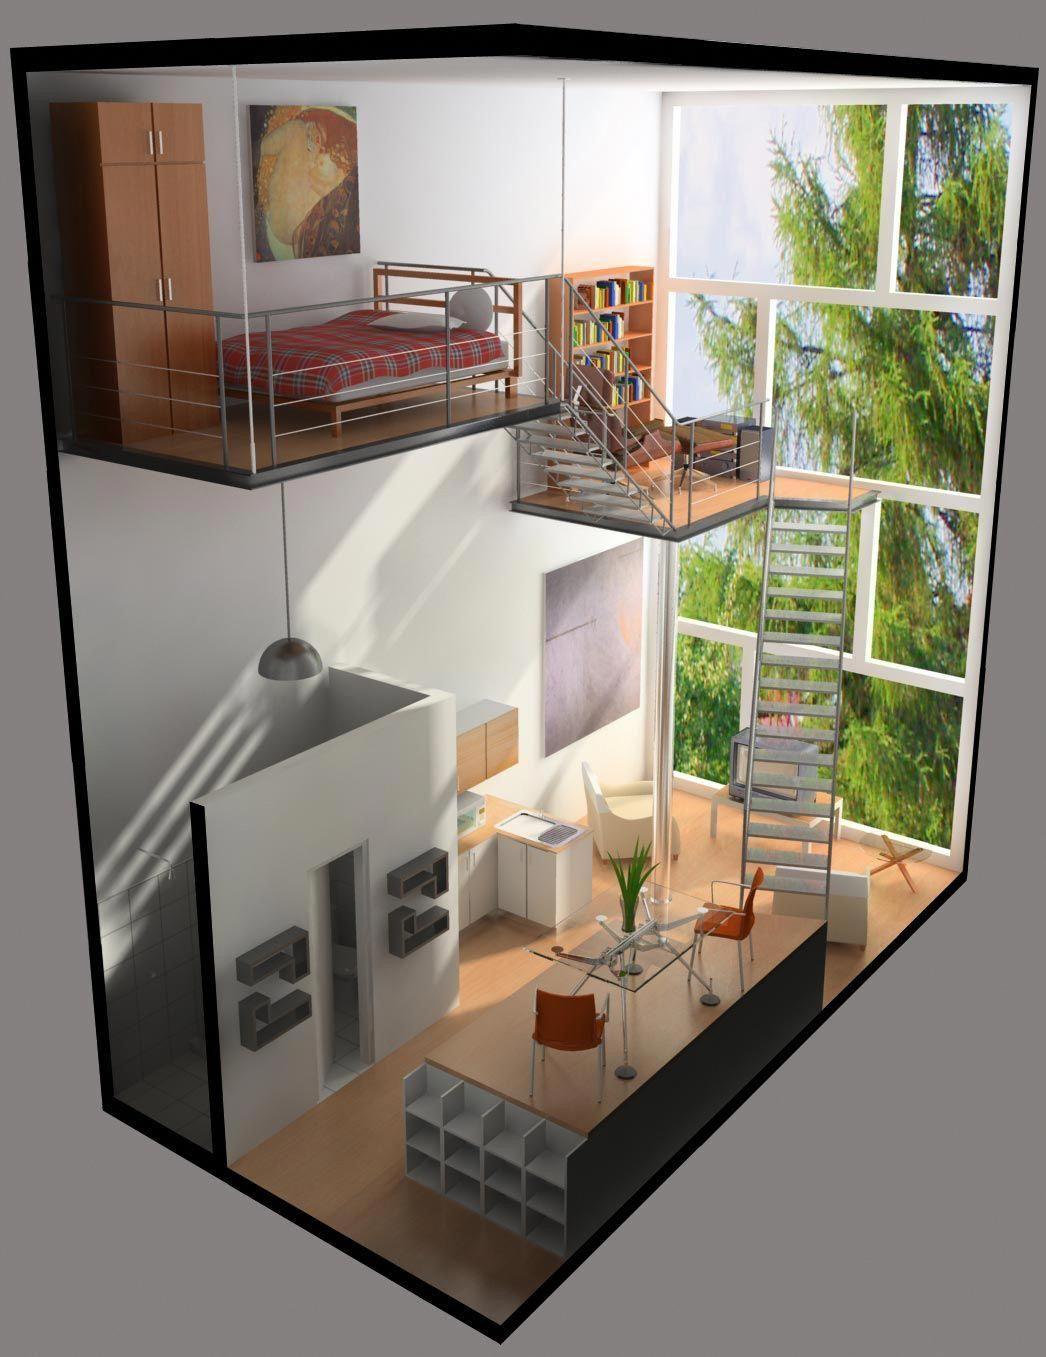 3dinteriordesign 3dinteriordesign In 2020 Apartment Architecture House House Layouts